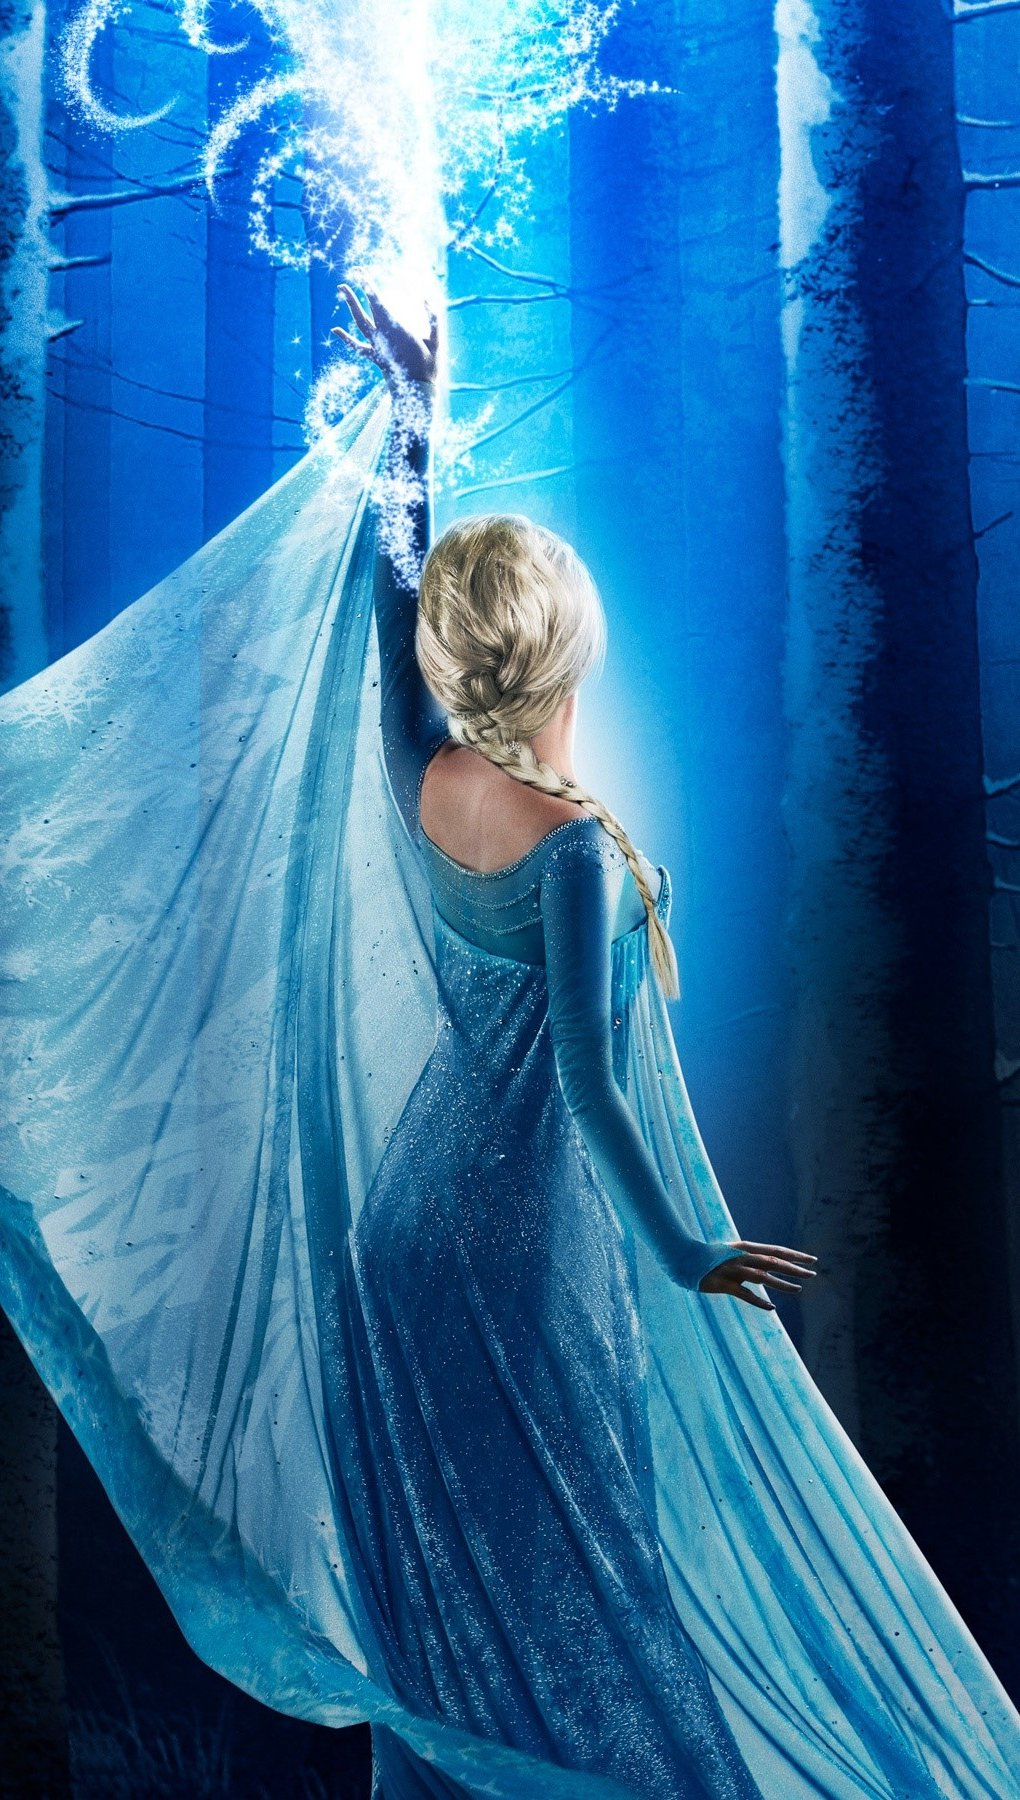 Fondos de pantalla Elsa en Once upon a time Vertical